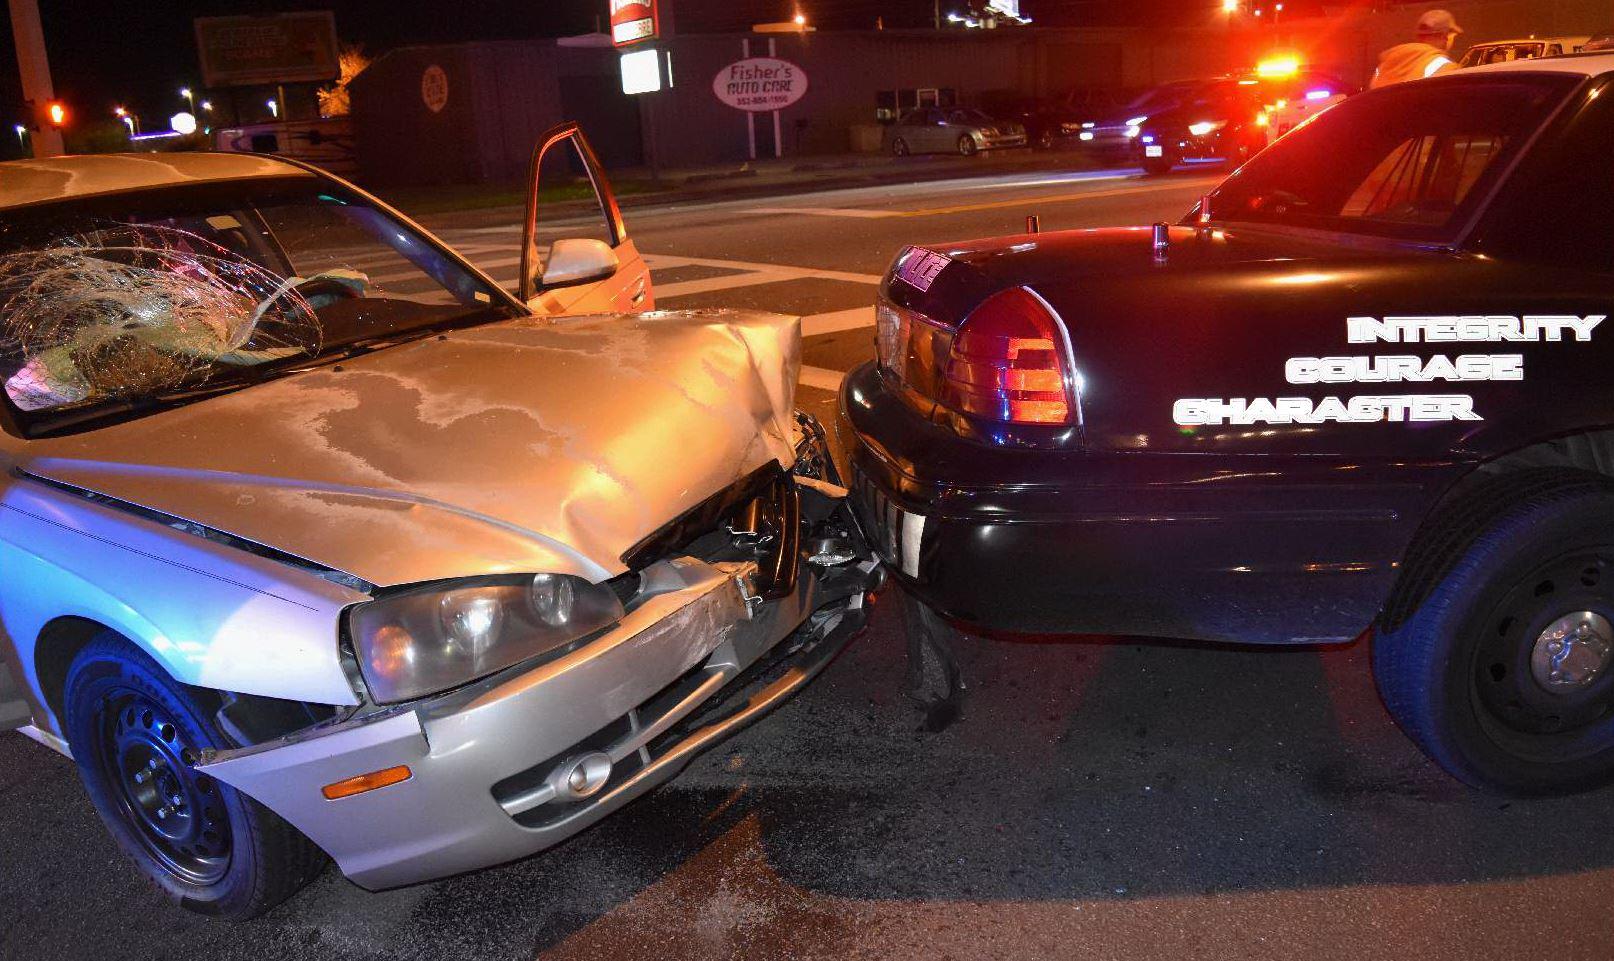 opd crash, police cruiser hit, ocala post, ocala news